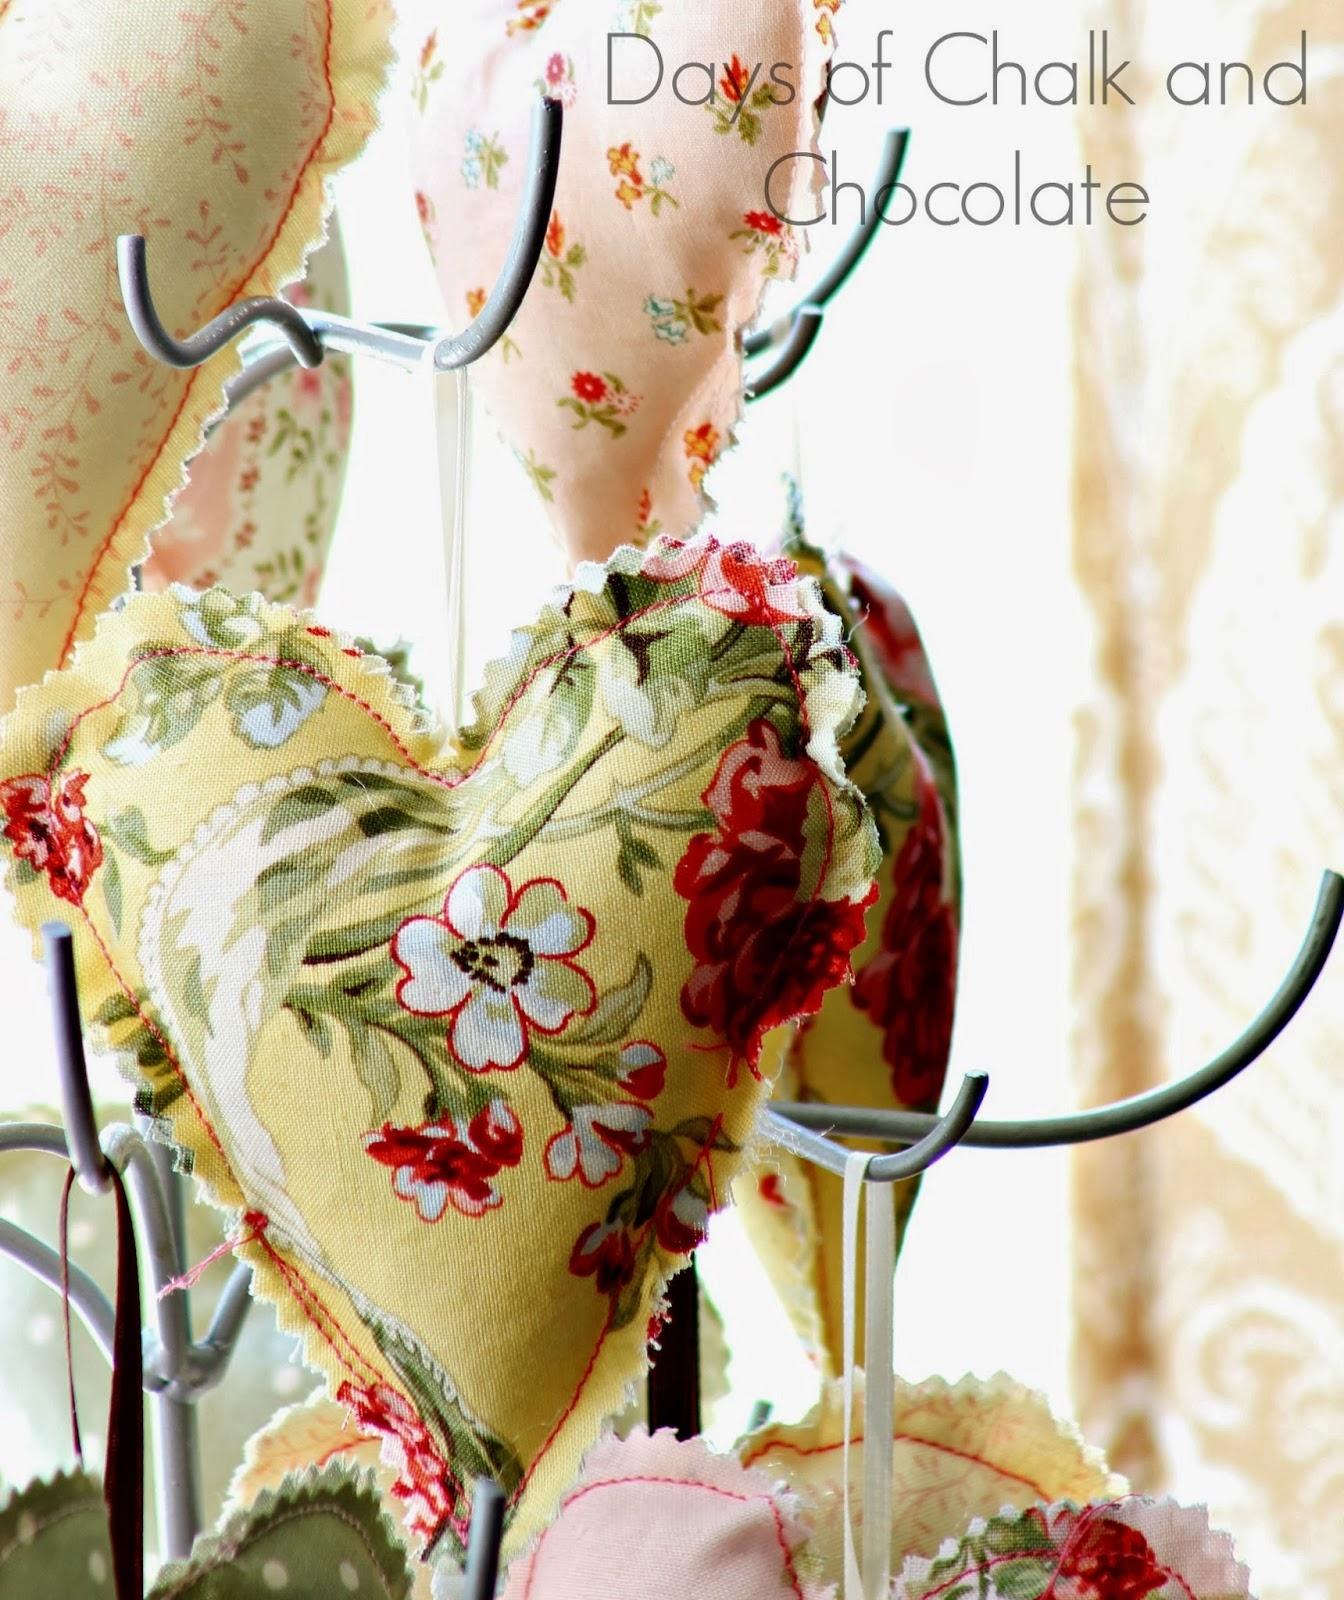 http://daysofchalkandchocolate.blogspot.com/2014/01/bust-your-stash-scrap-fabric-hearts.html